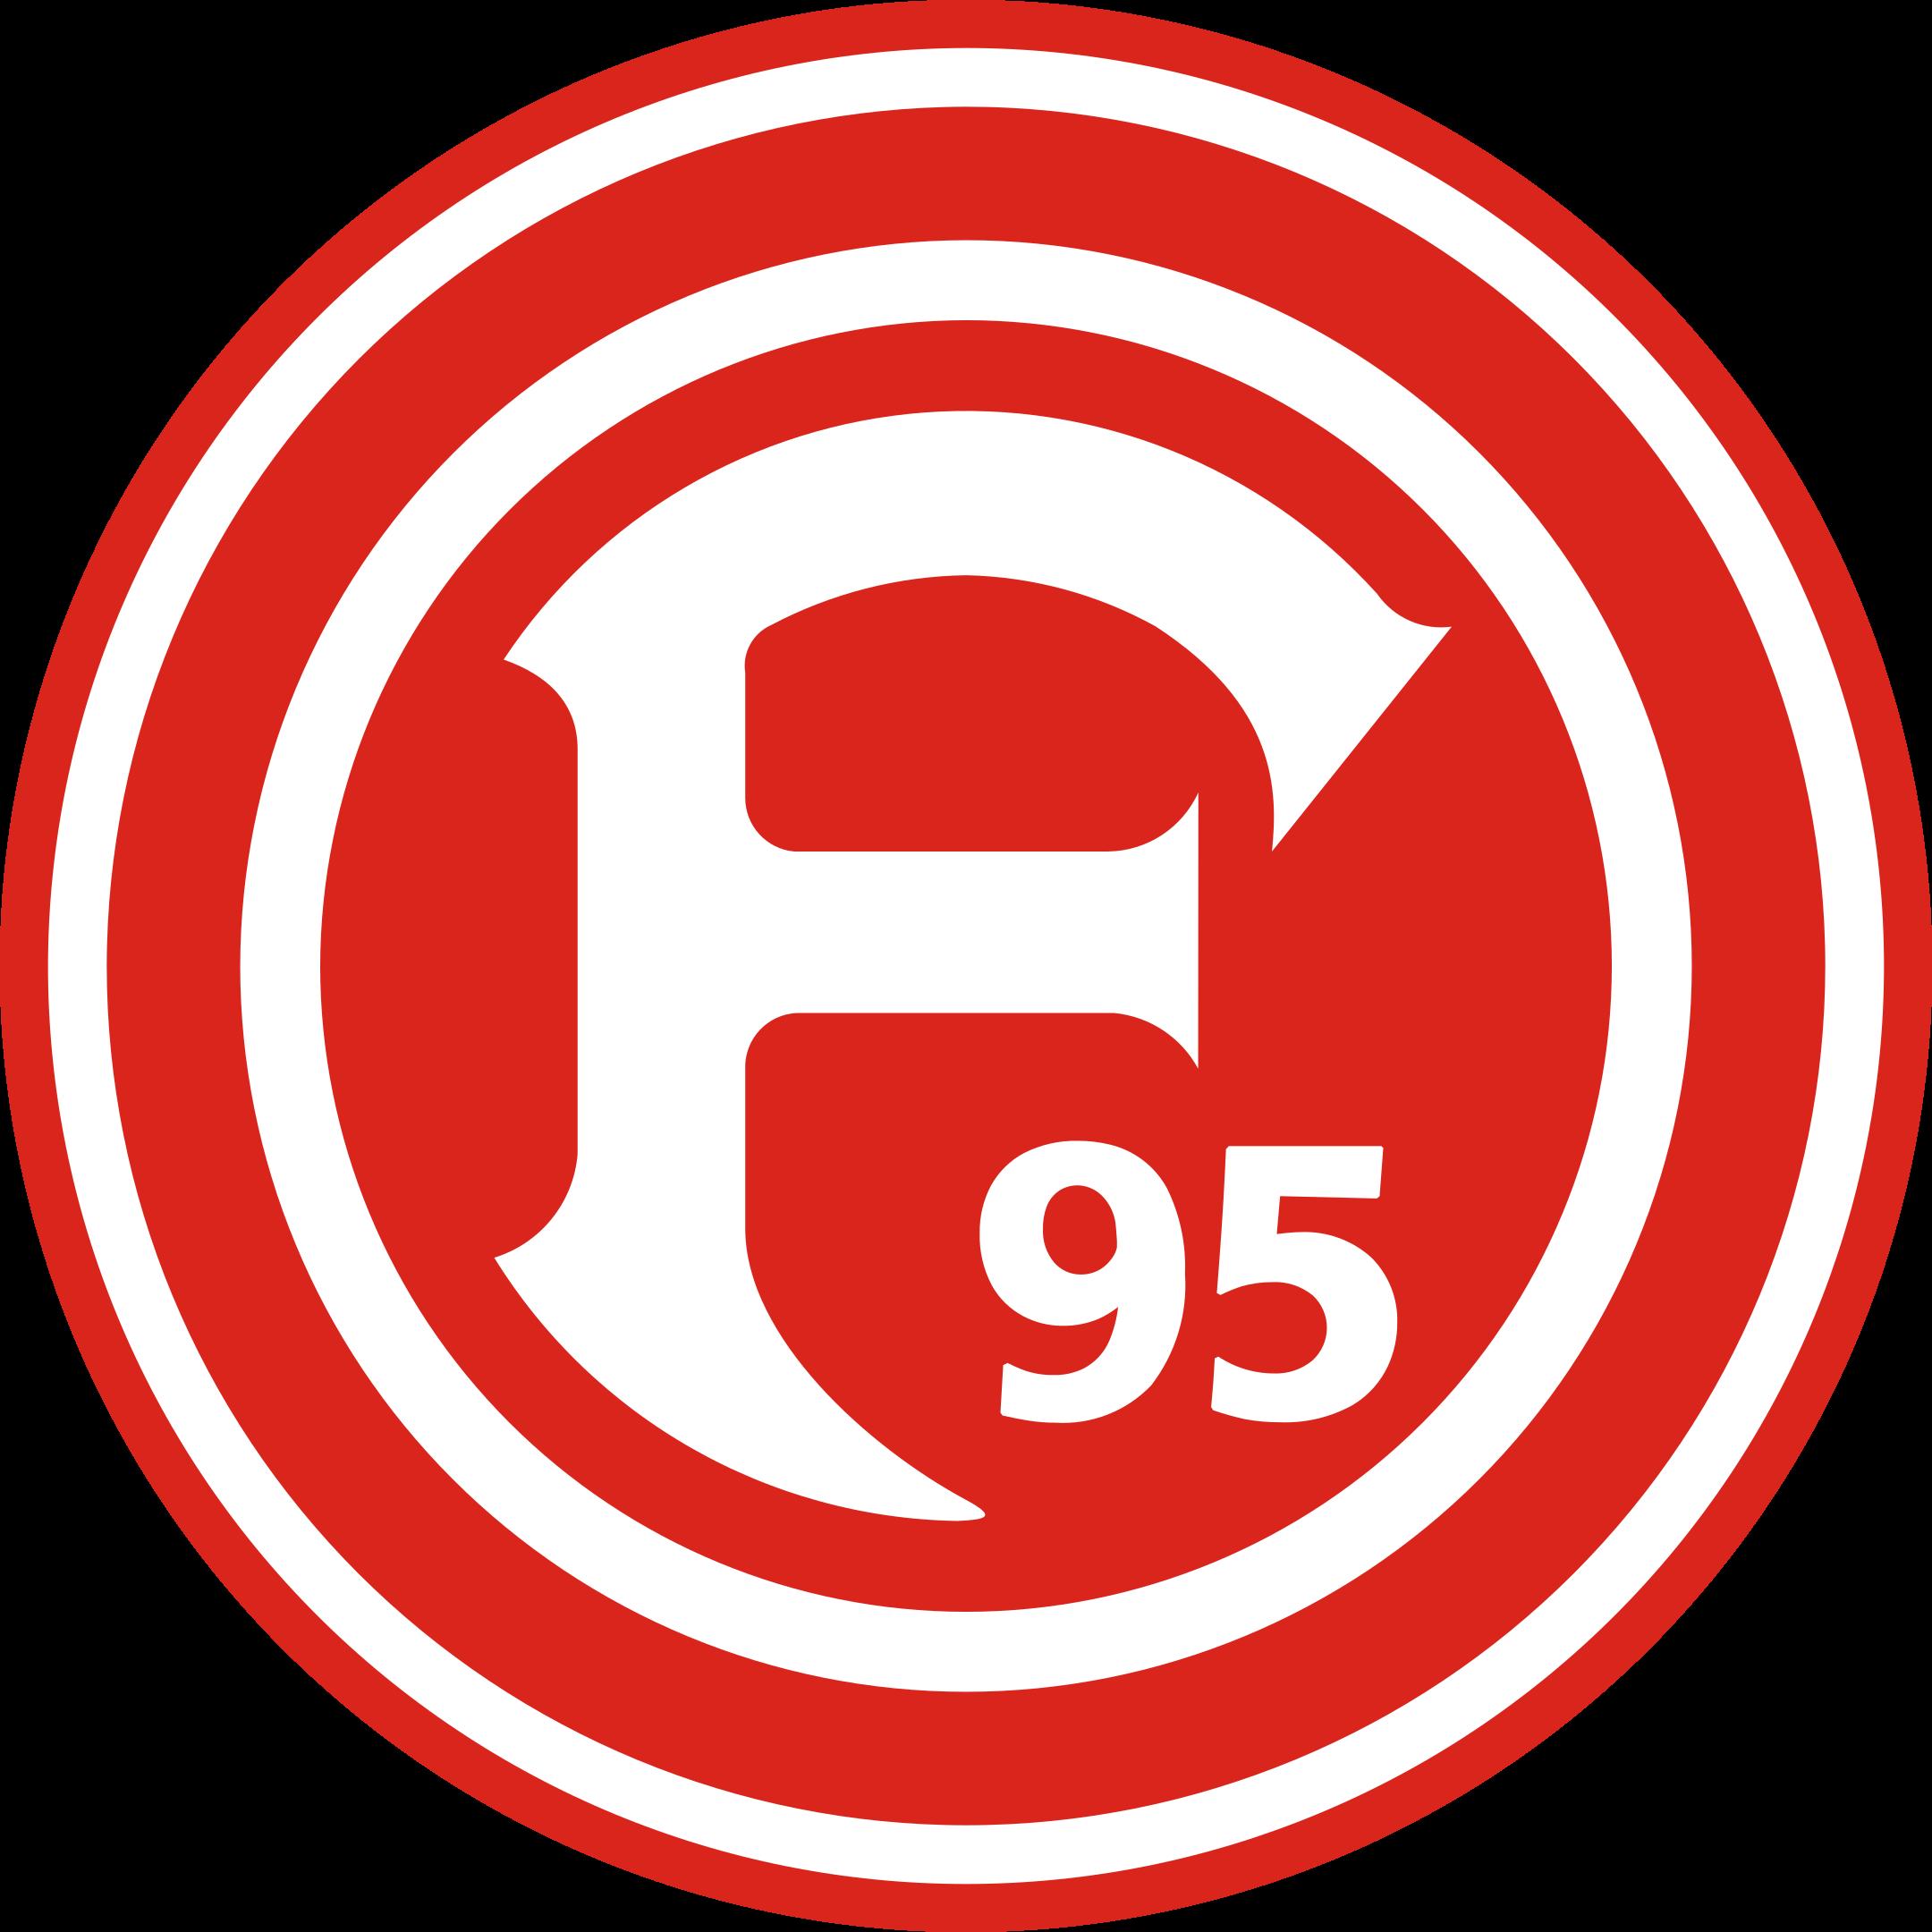 fortuna dusseldorf logo 1 - Fortuna Düsseldorf Logo